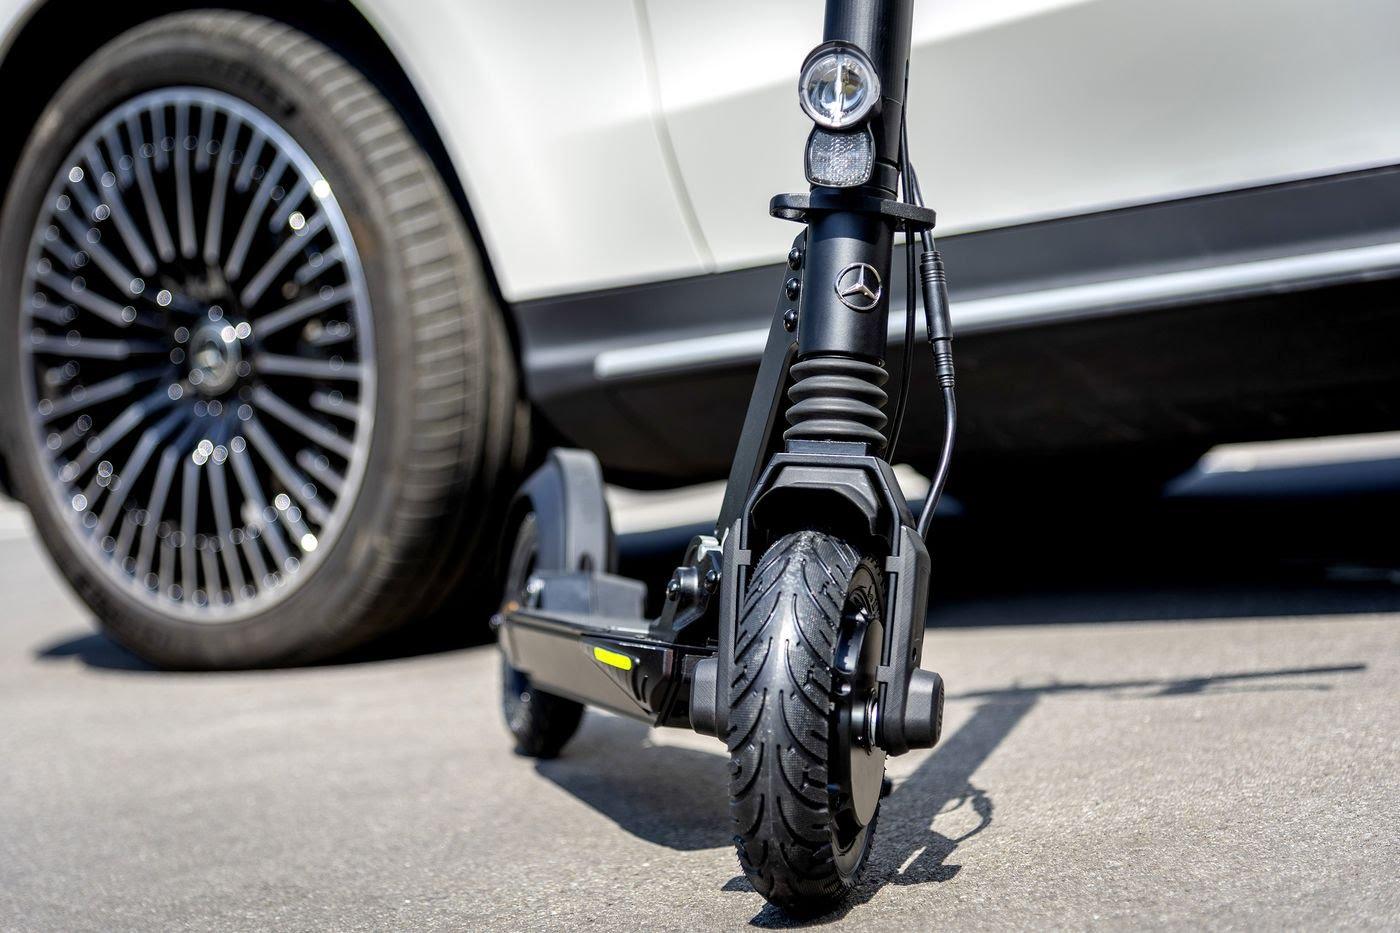 Mercedes Benz e-scooter